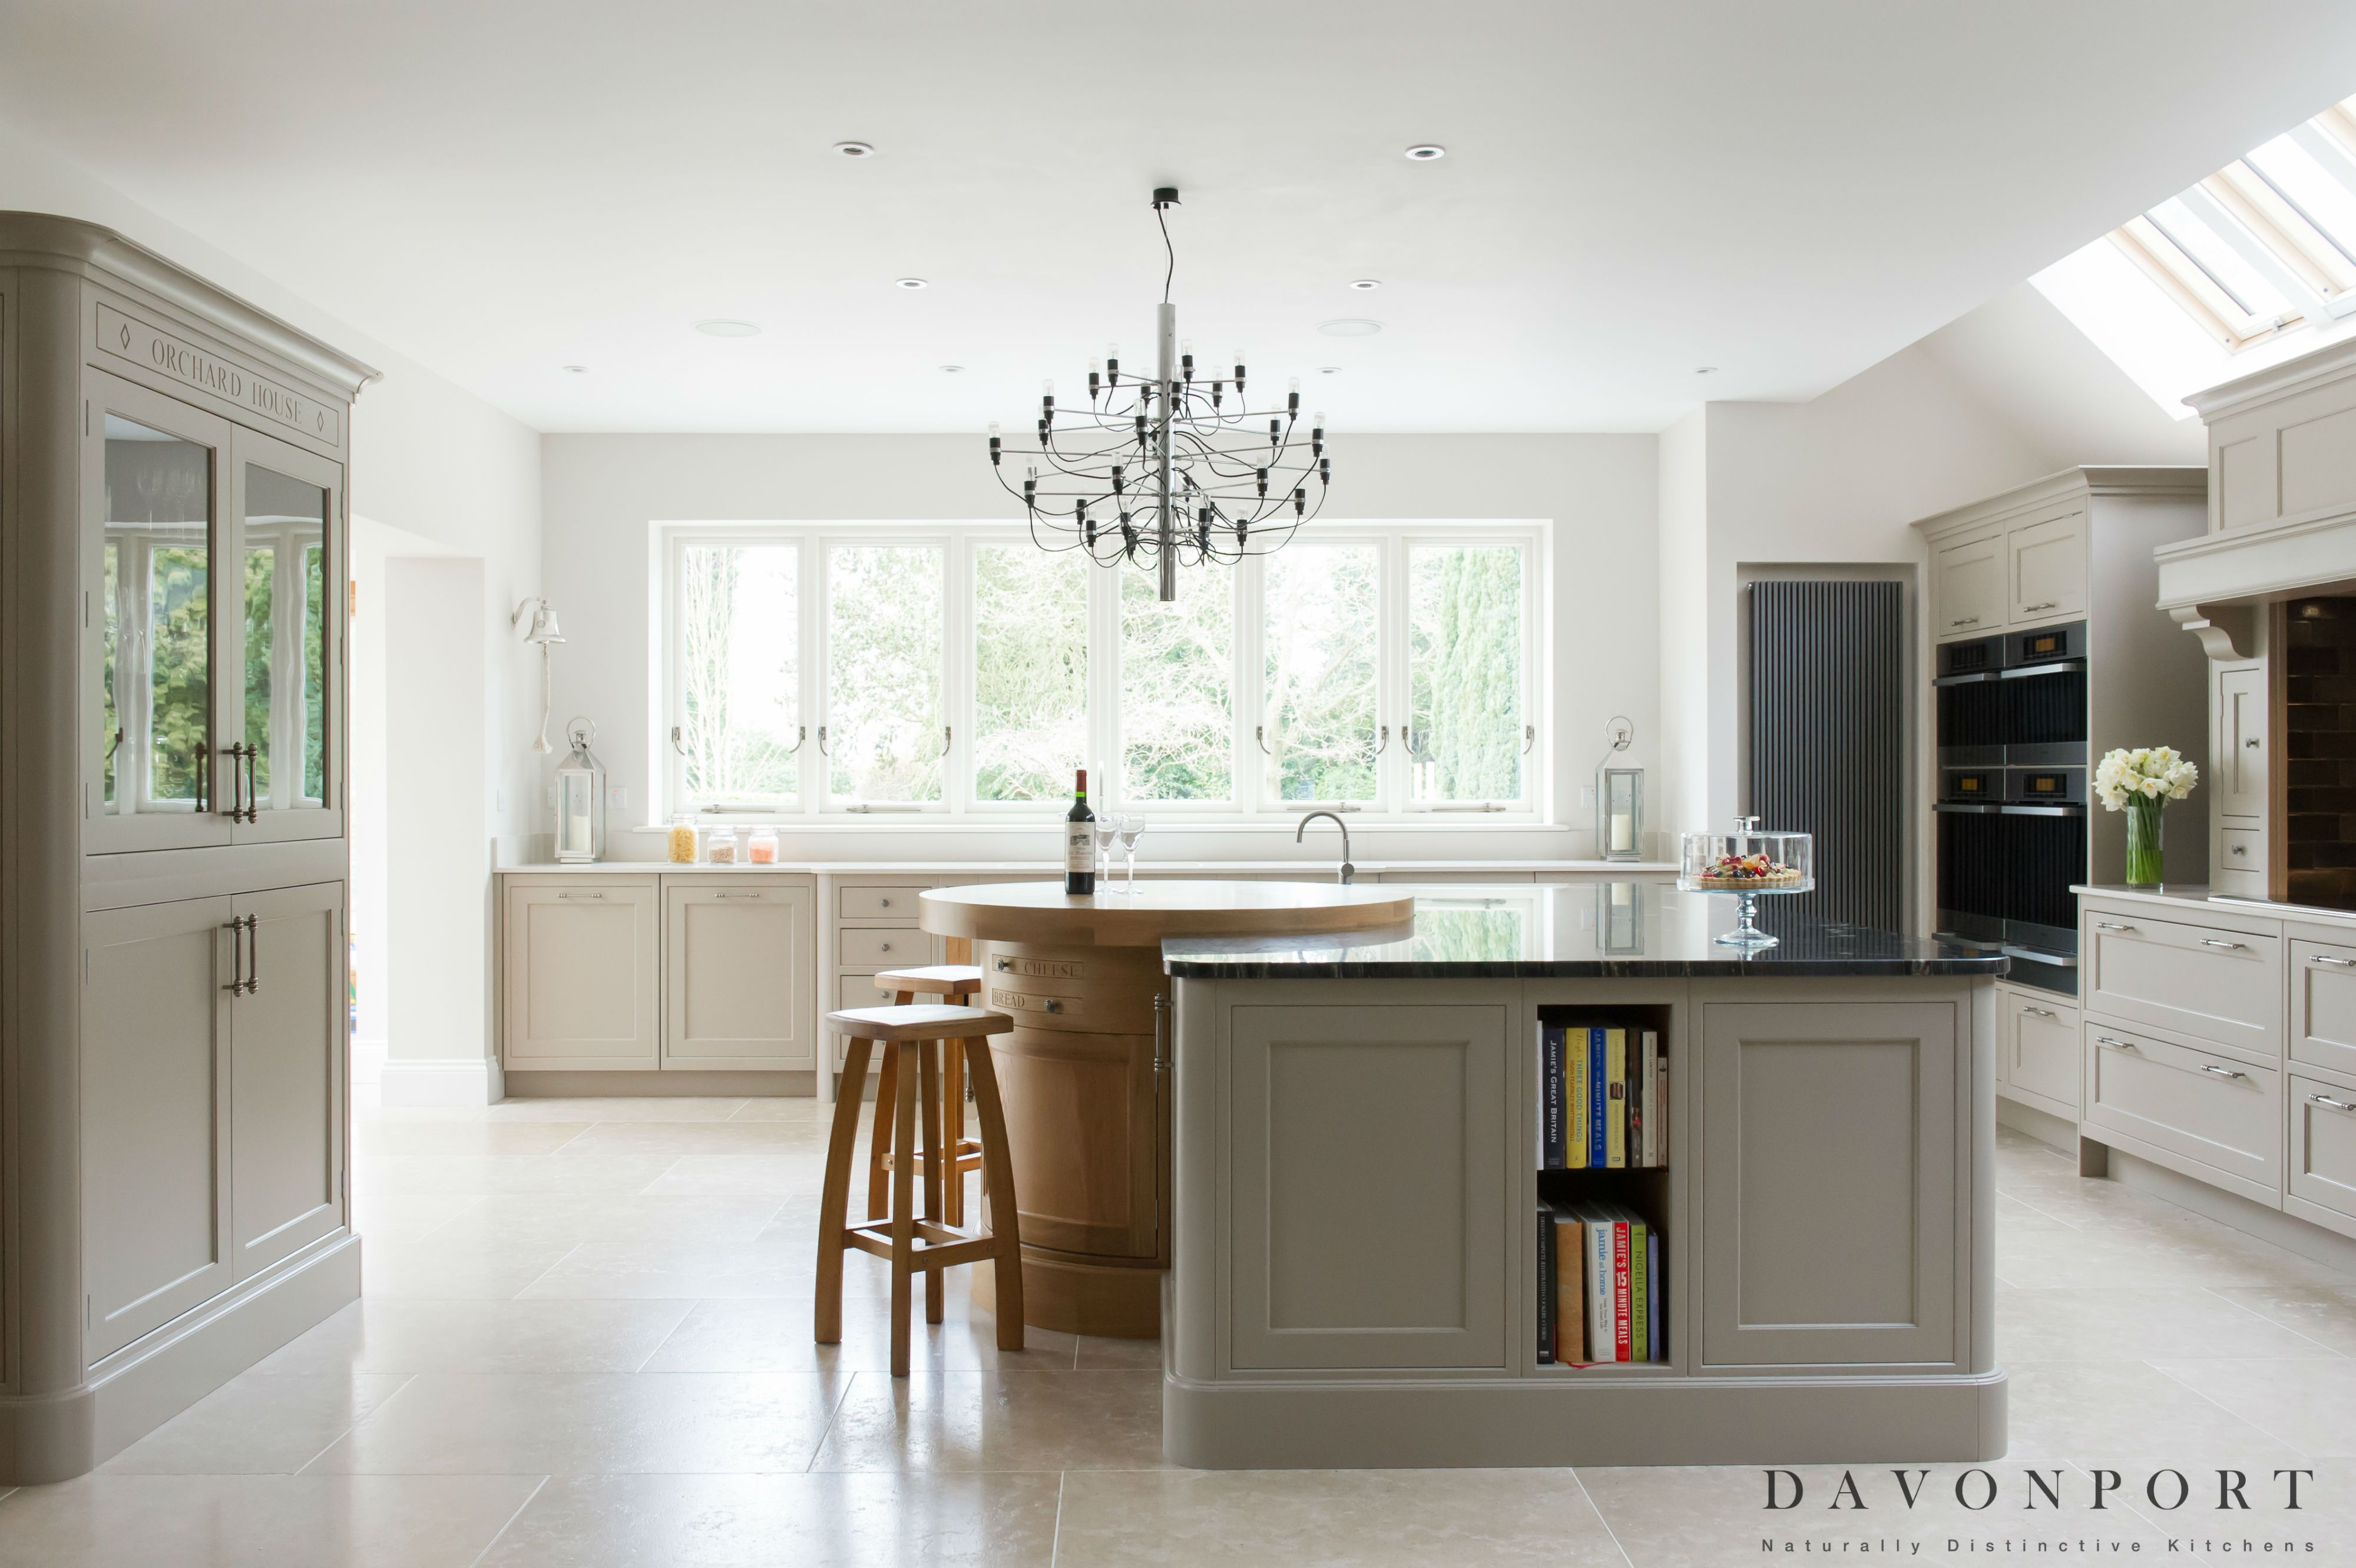 Pin by Brenda Hampton on Home - Kitchens | Pinterest | English ...